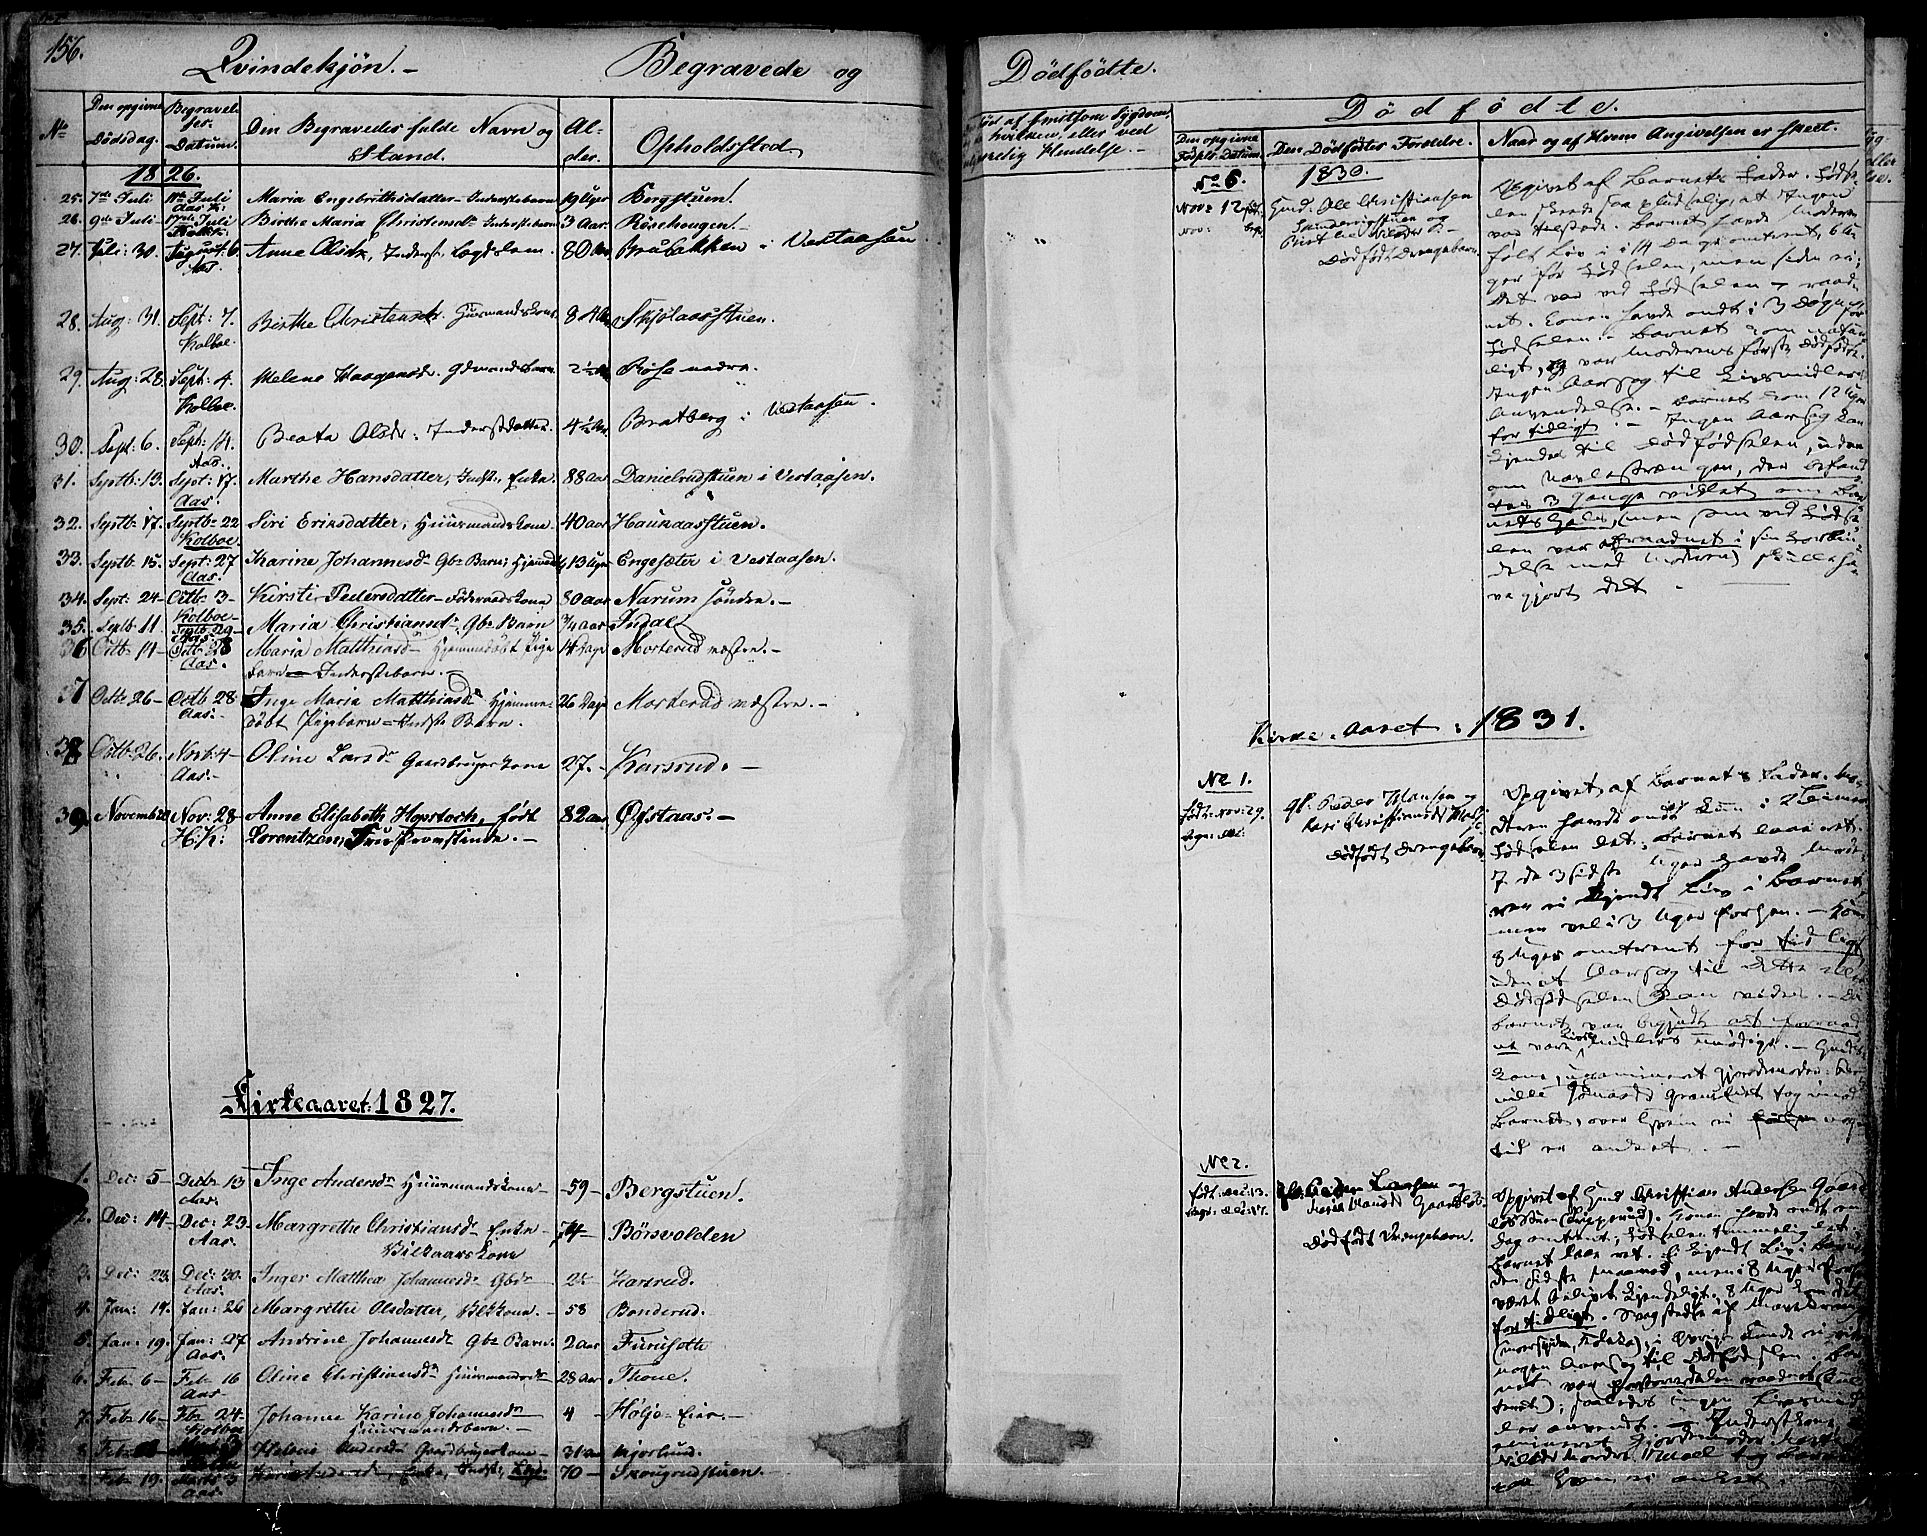 SAH, Vestre Toten prestekontor, H/Ha/Haa/L0002: Ministerialbok nr. 2, 1825-1837, s. 156